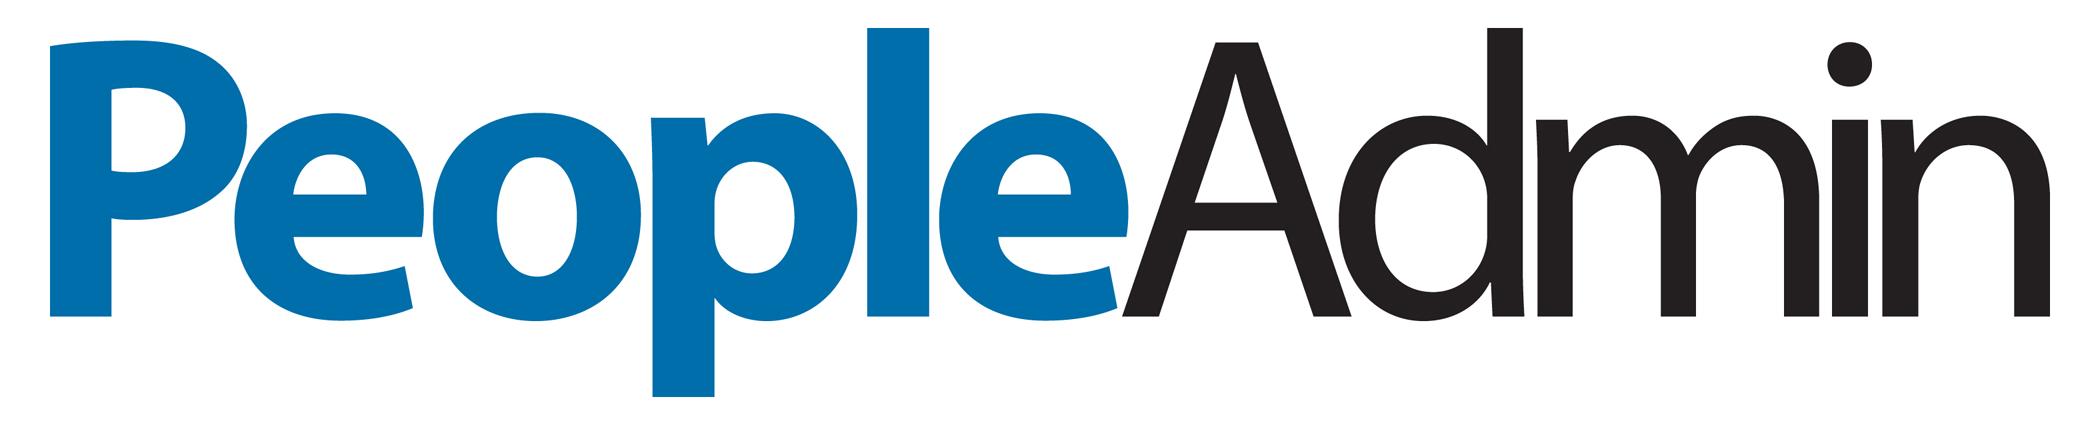 PeopleAdmin logo_new.jpg